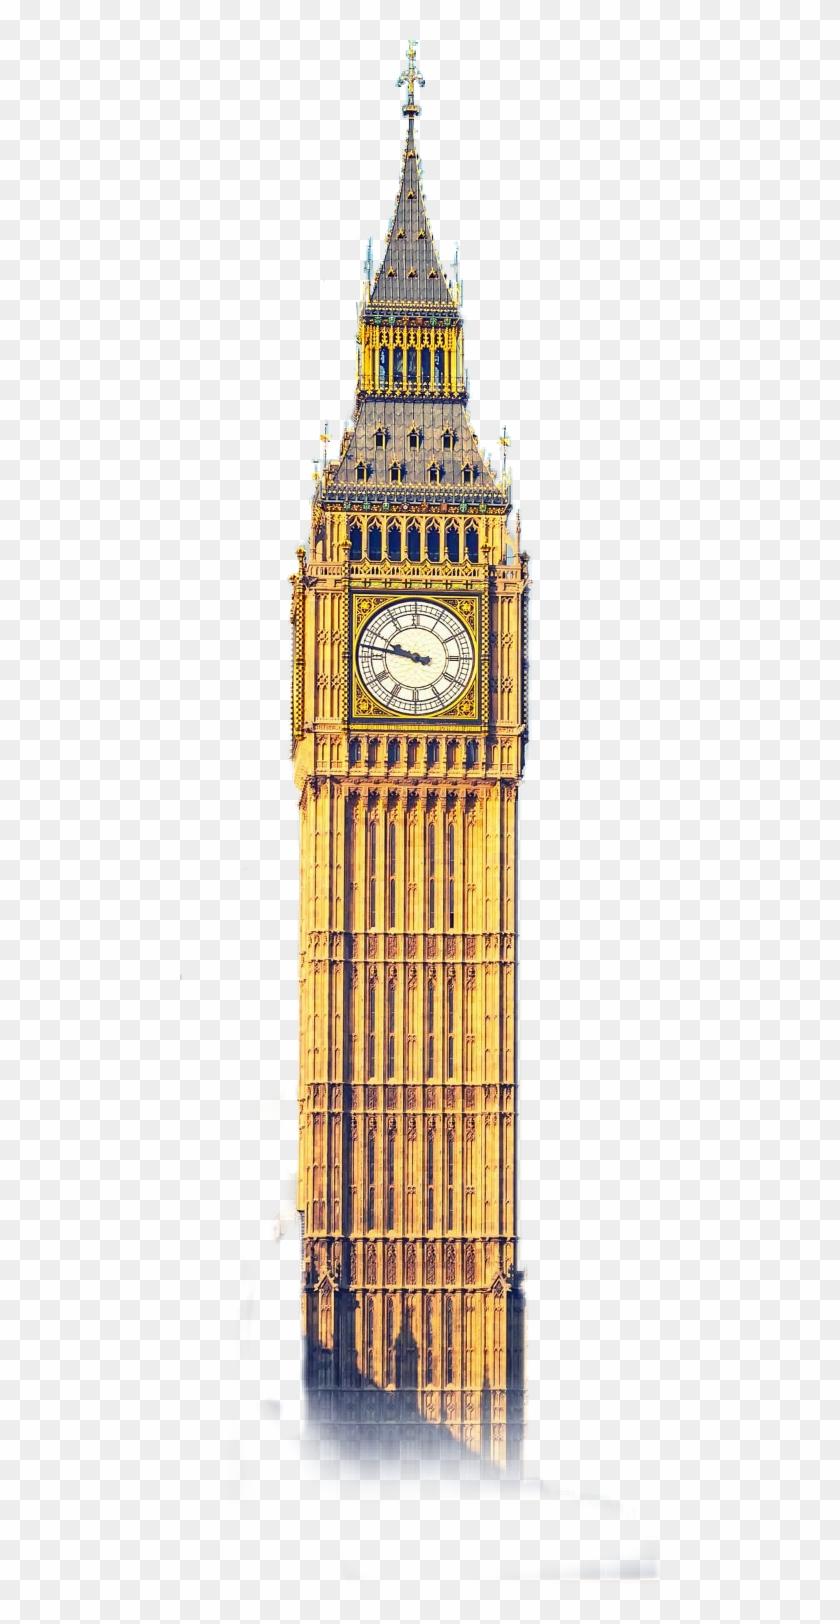 London clipart monument london. Houses of parliament hd